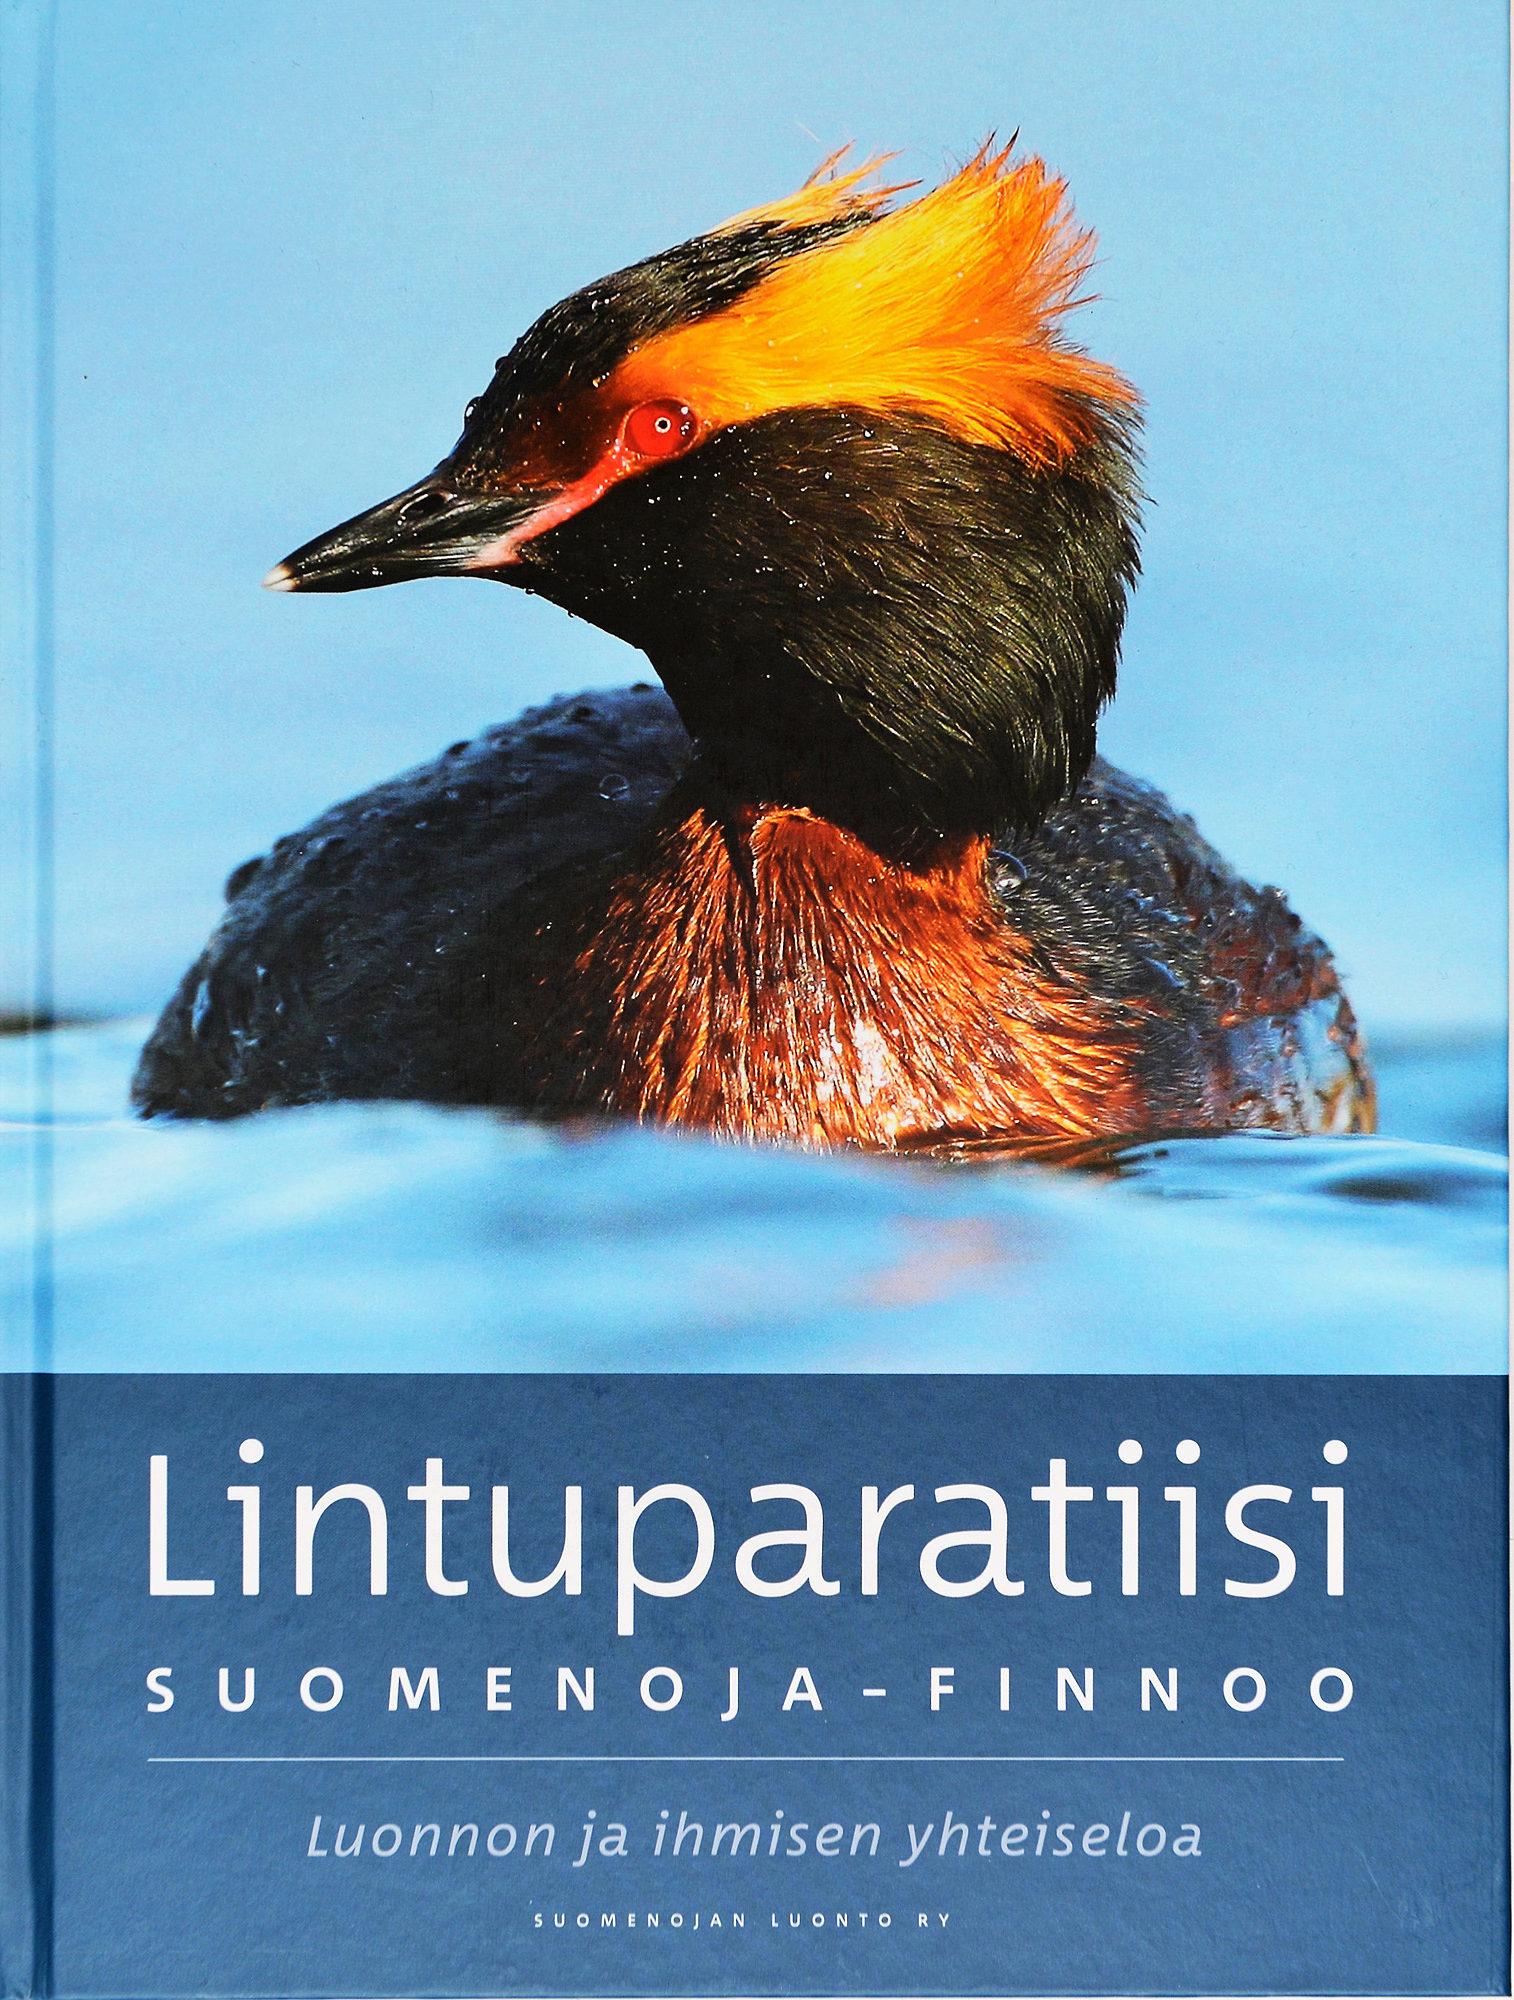 Lintuparatiisi Suomenoja-Finnoo